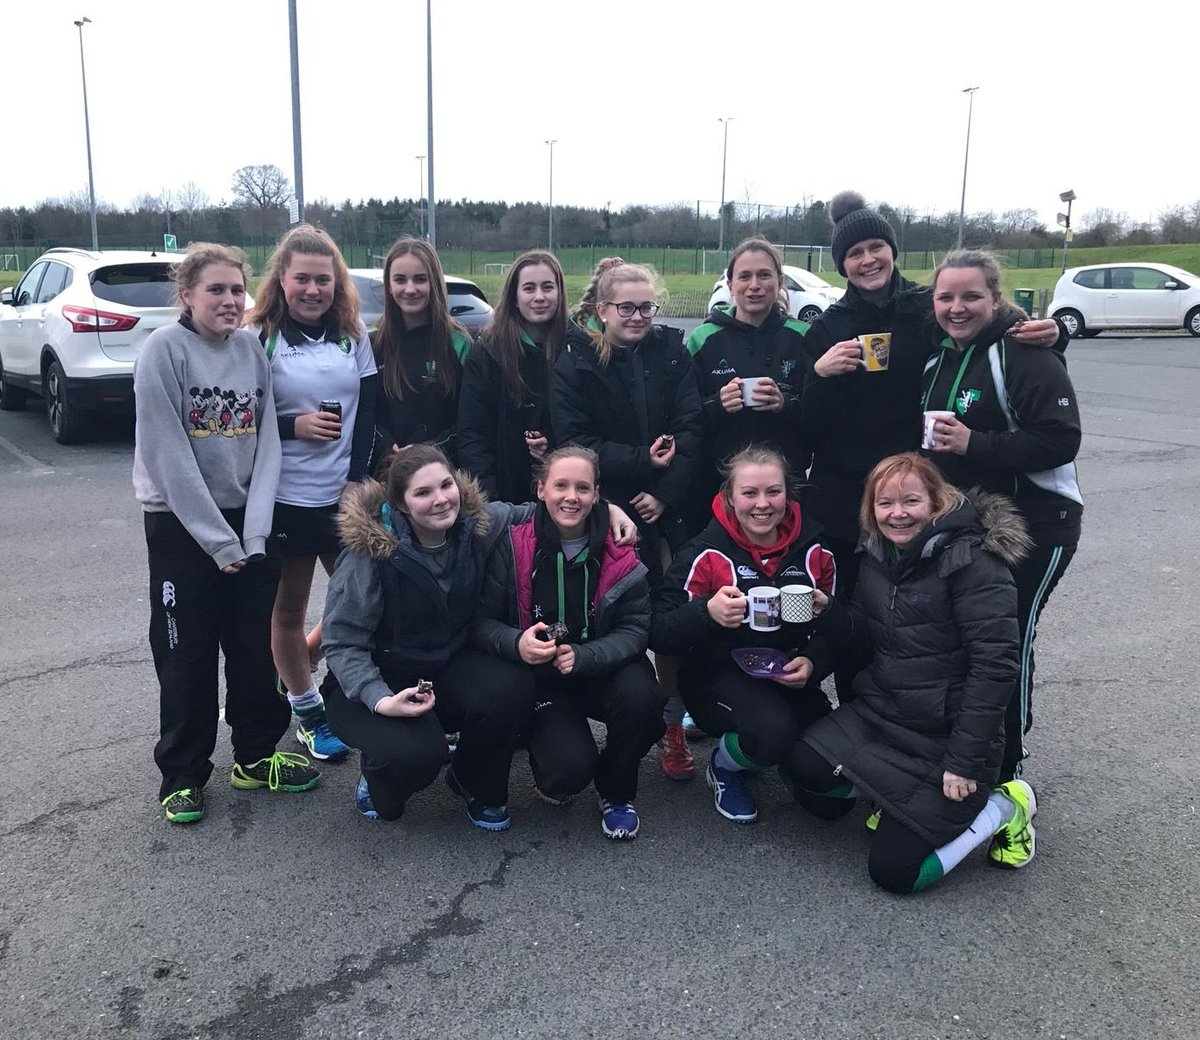 Ladies 2s enjoyed a 2-0 win over @StratfordHockey. Goals from Emilia and Charlotte 👌🏼  #WeAreHampton 💚🖤💚